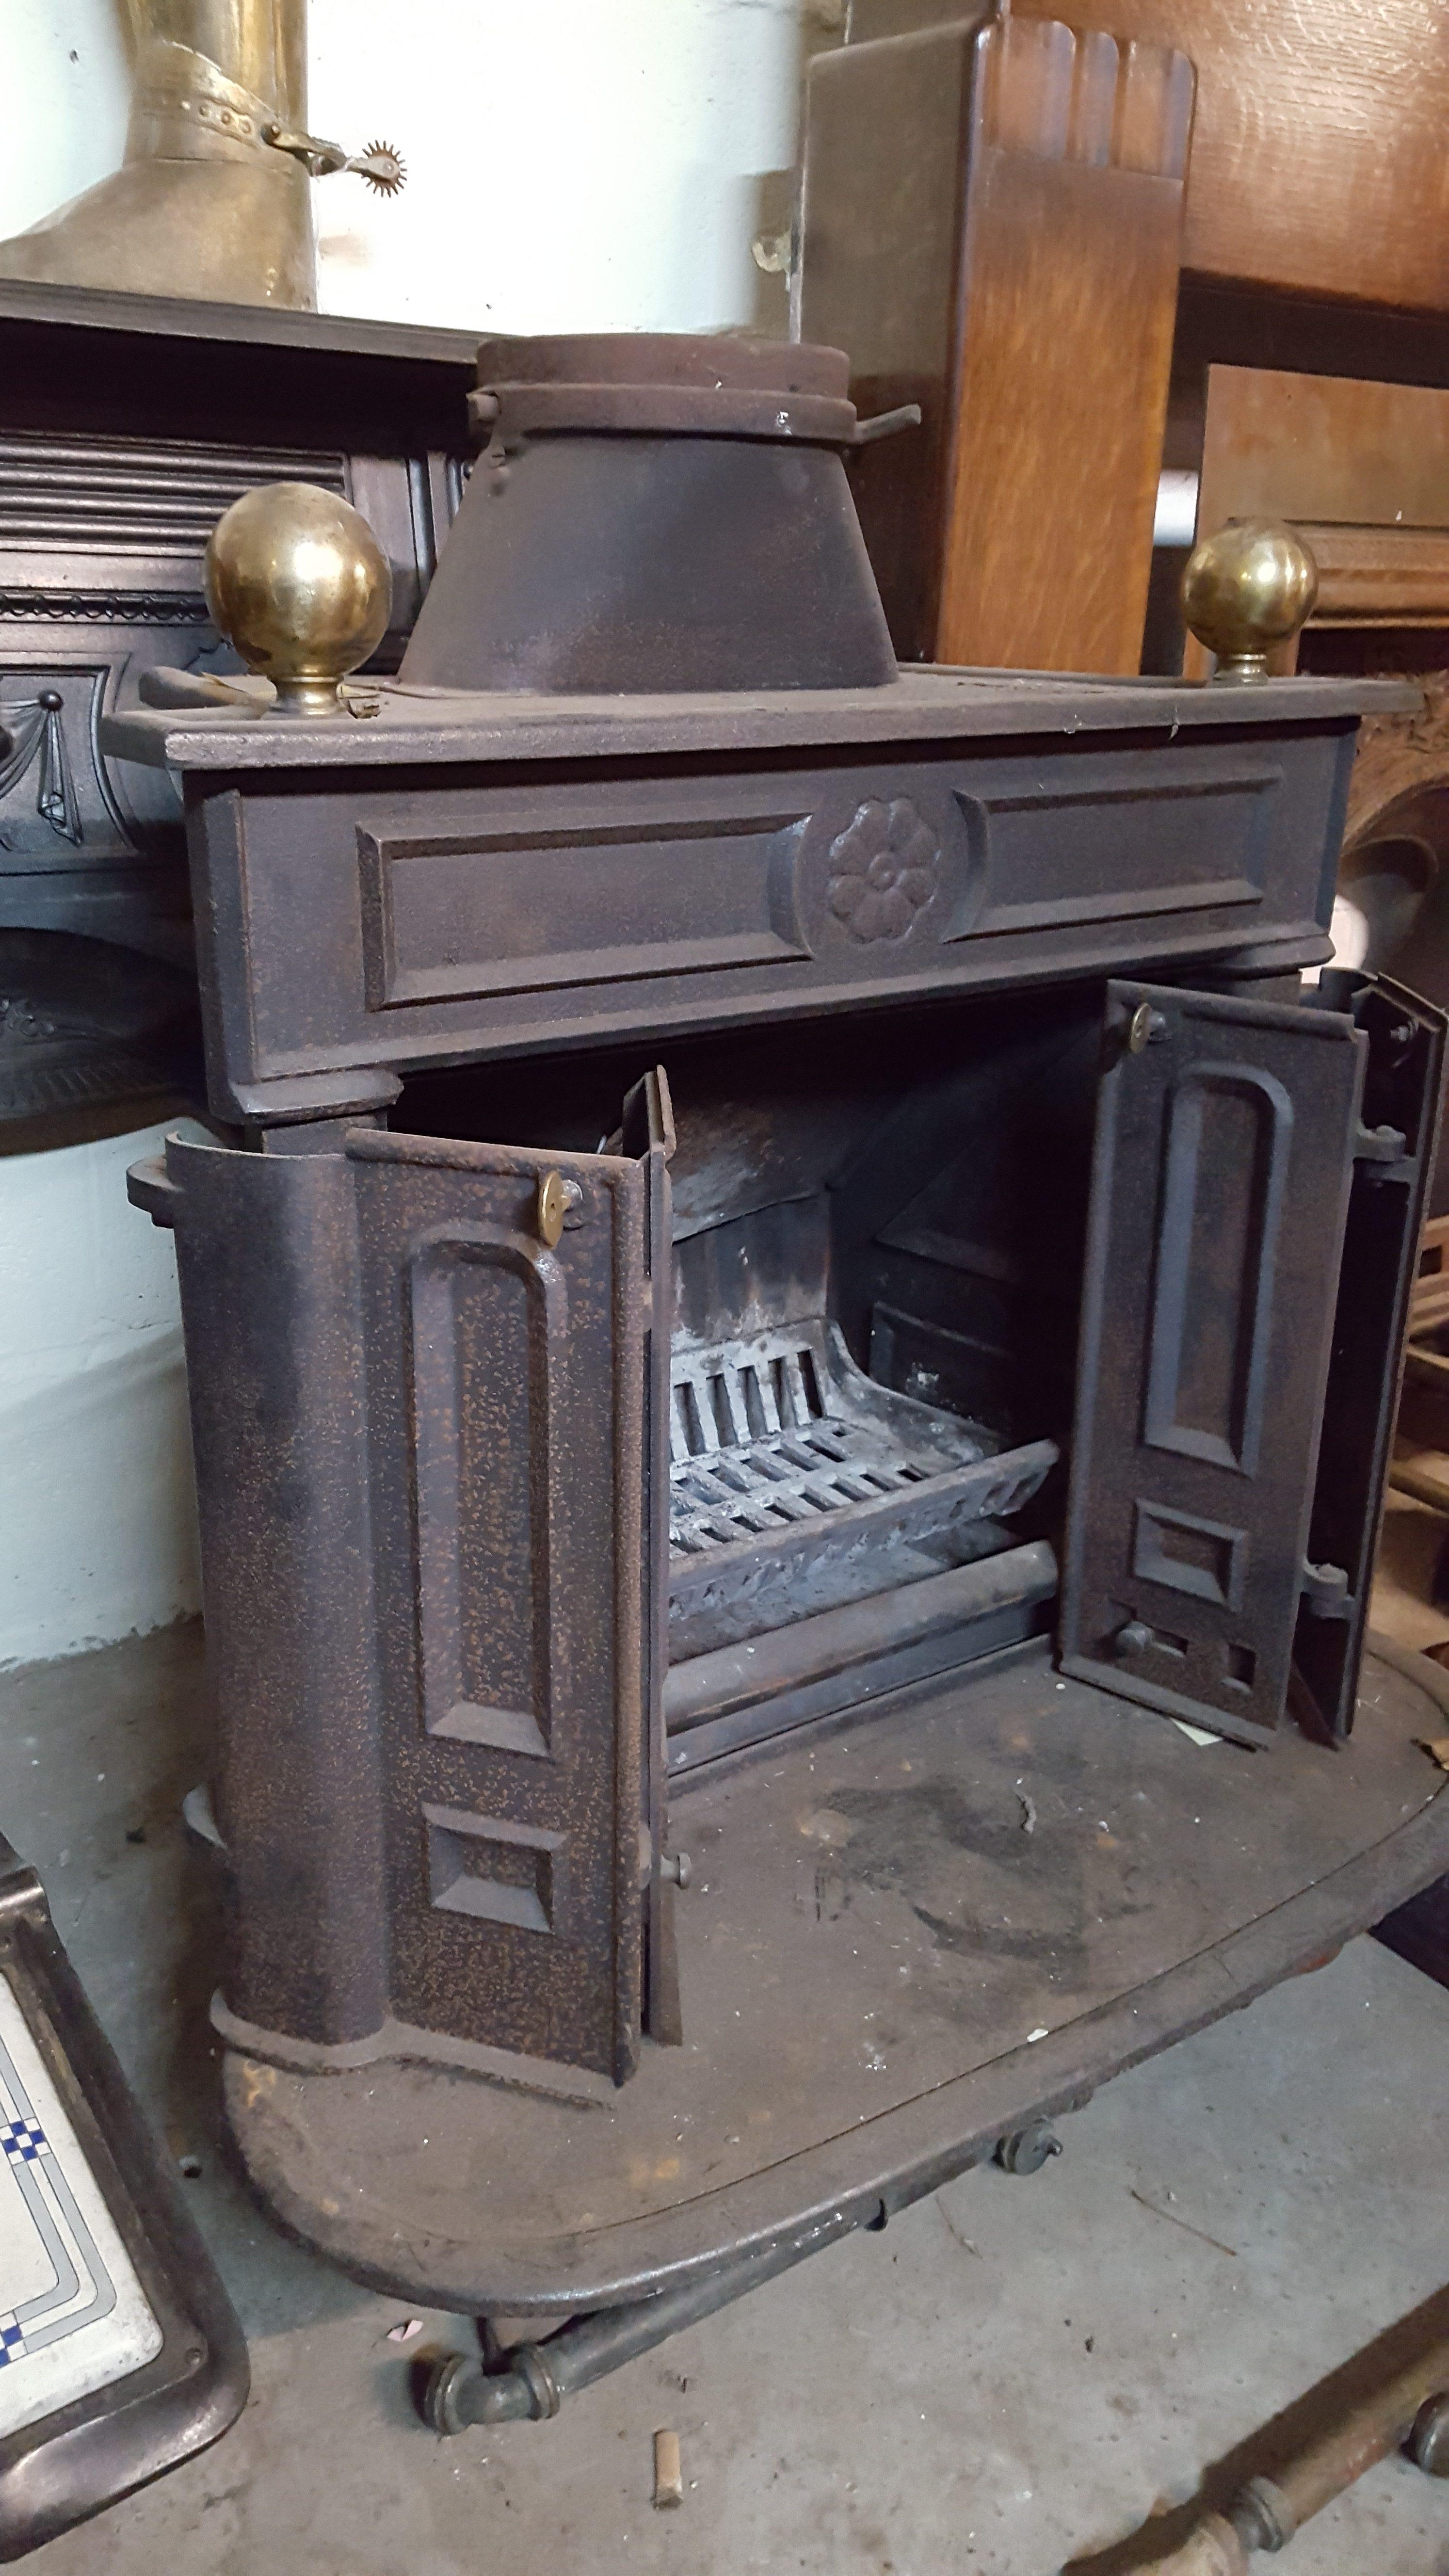 black cast iron log burner fire with brass knobs a and d. Black Bedroom Furniture Sets. Home Design Ideas